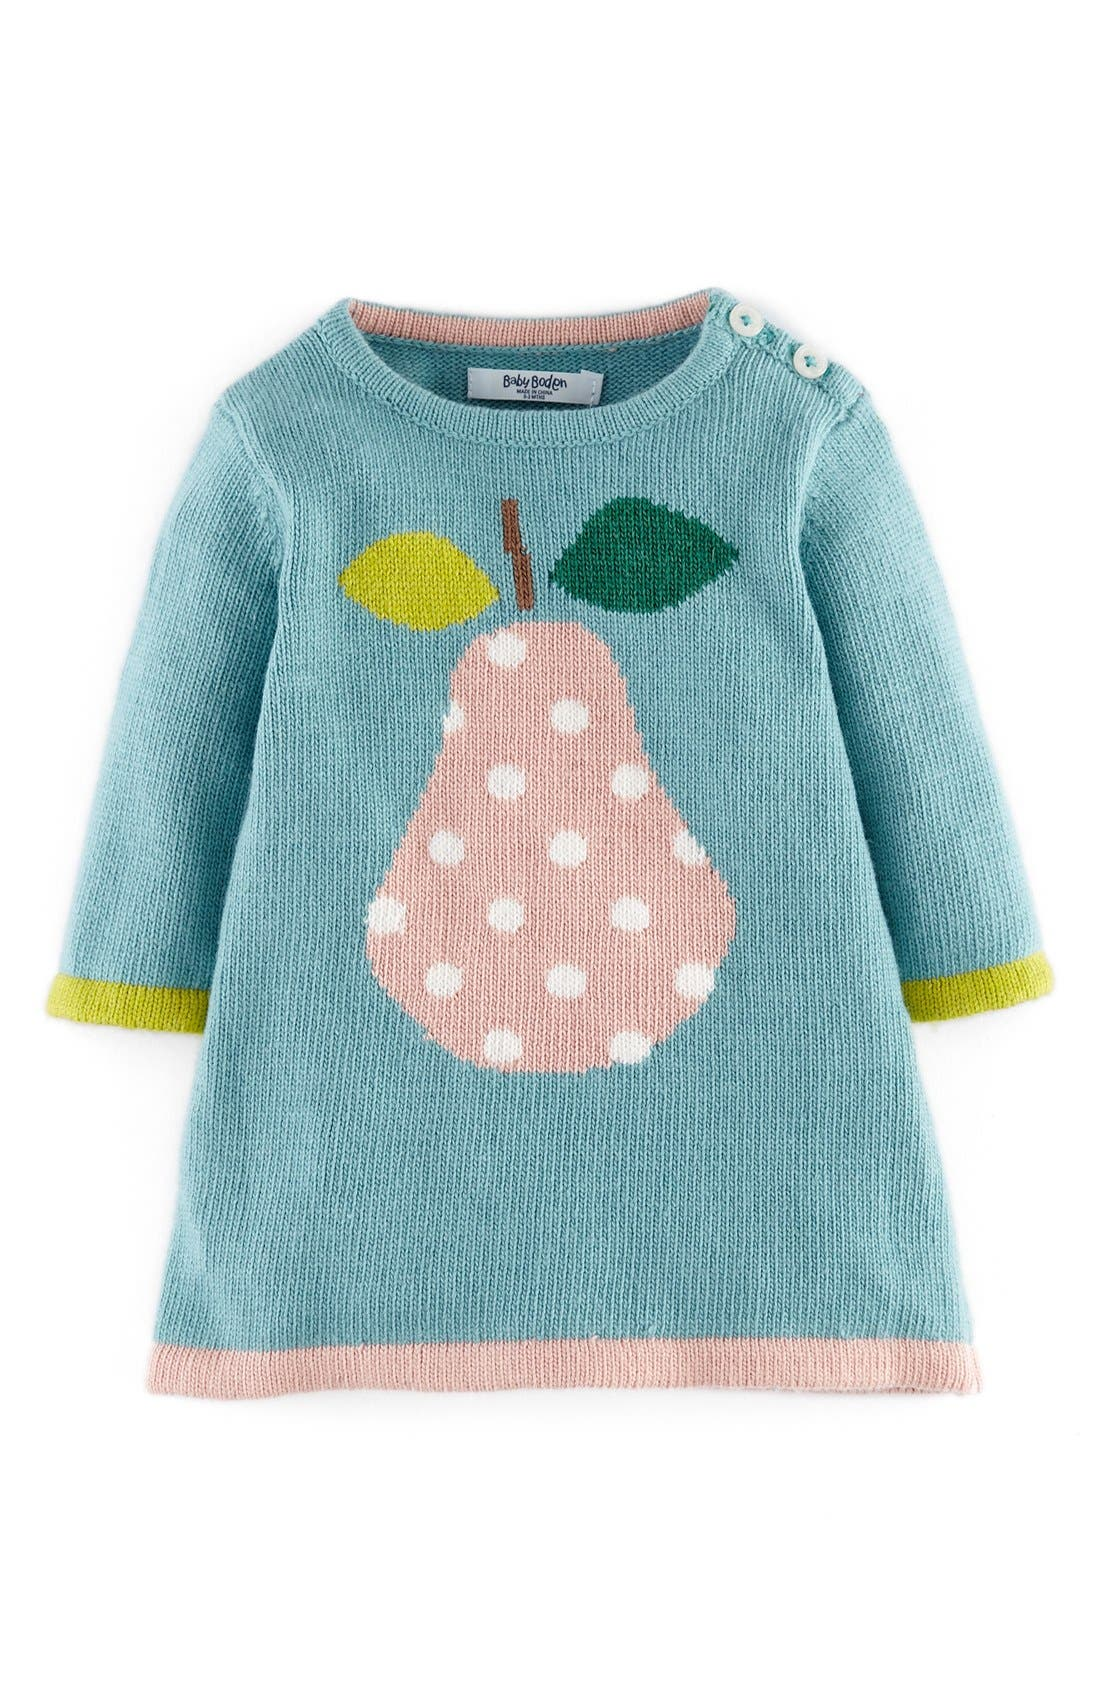 Alternate Image 1 Selected - Mini Boden Knit Dress (Baby Girls)